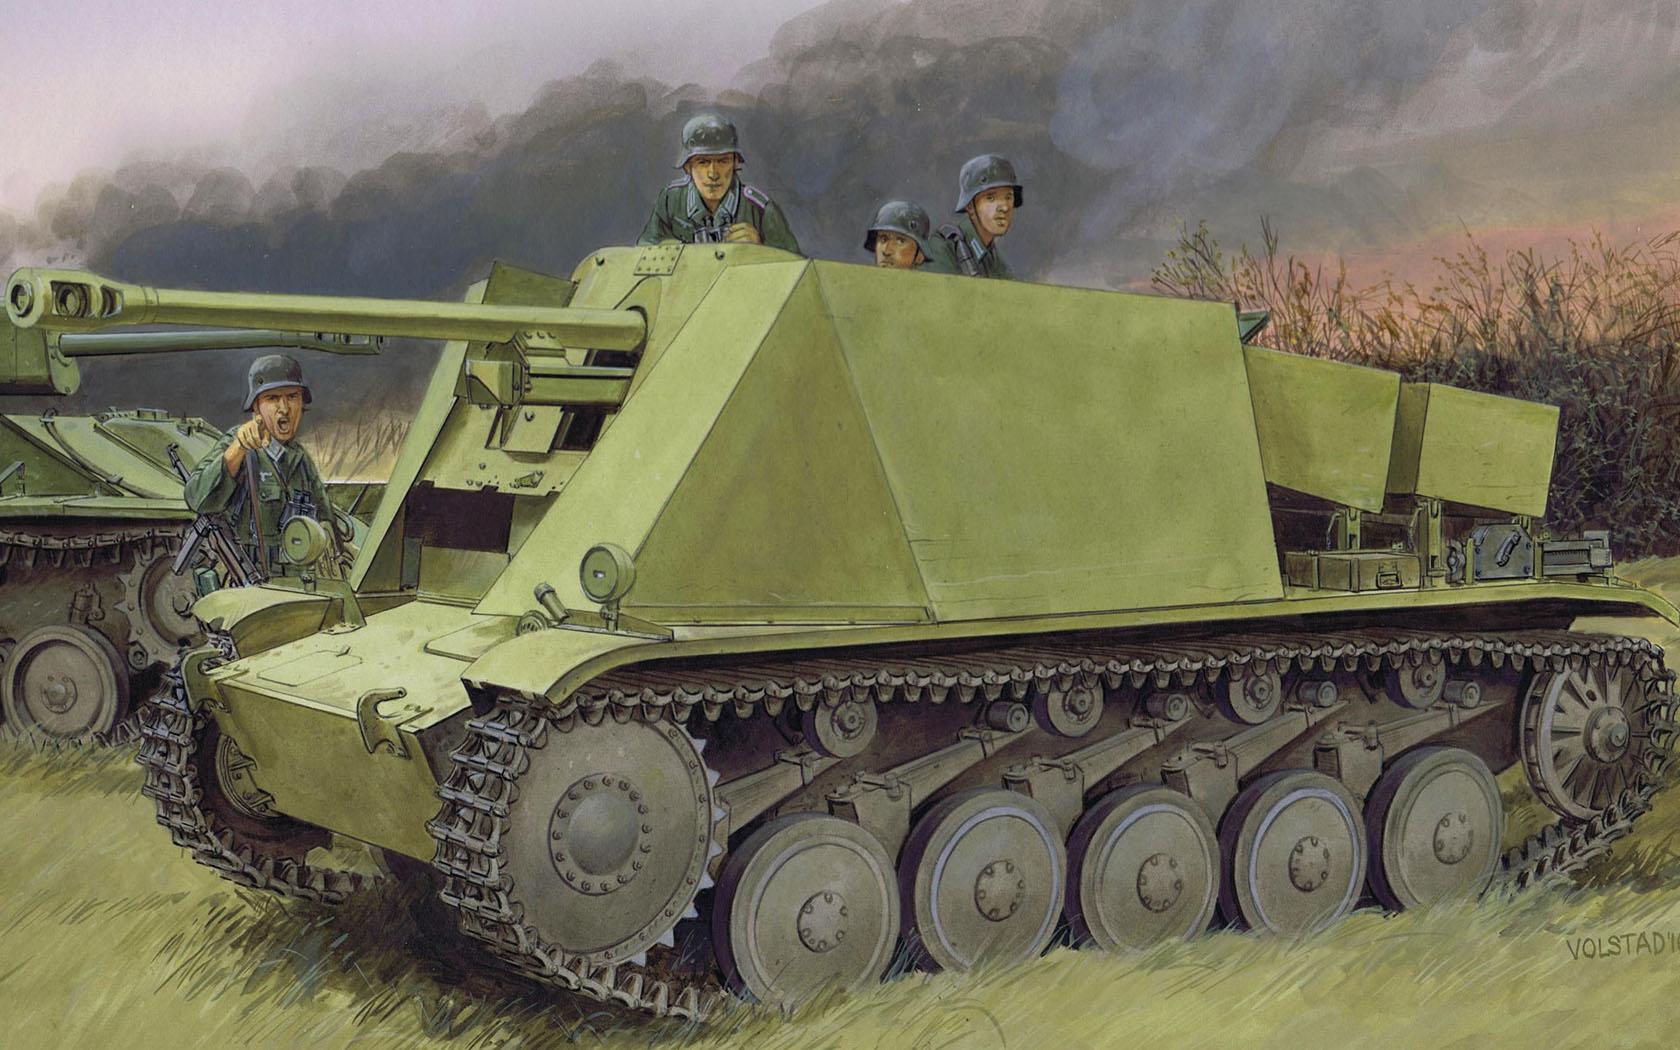 рисунок 5 cm PaK 38 L/60 auf Fgst. Pz. Kpfw. II